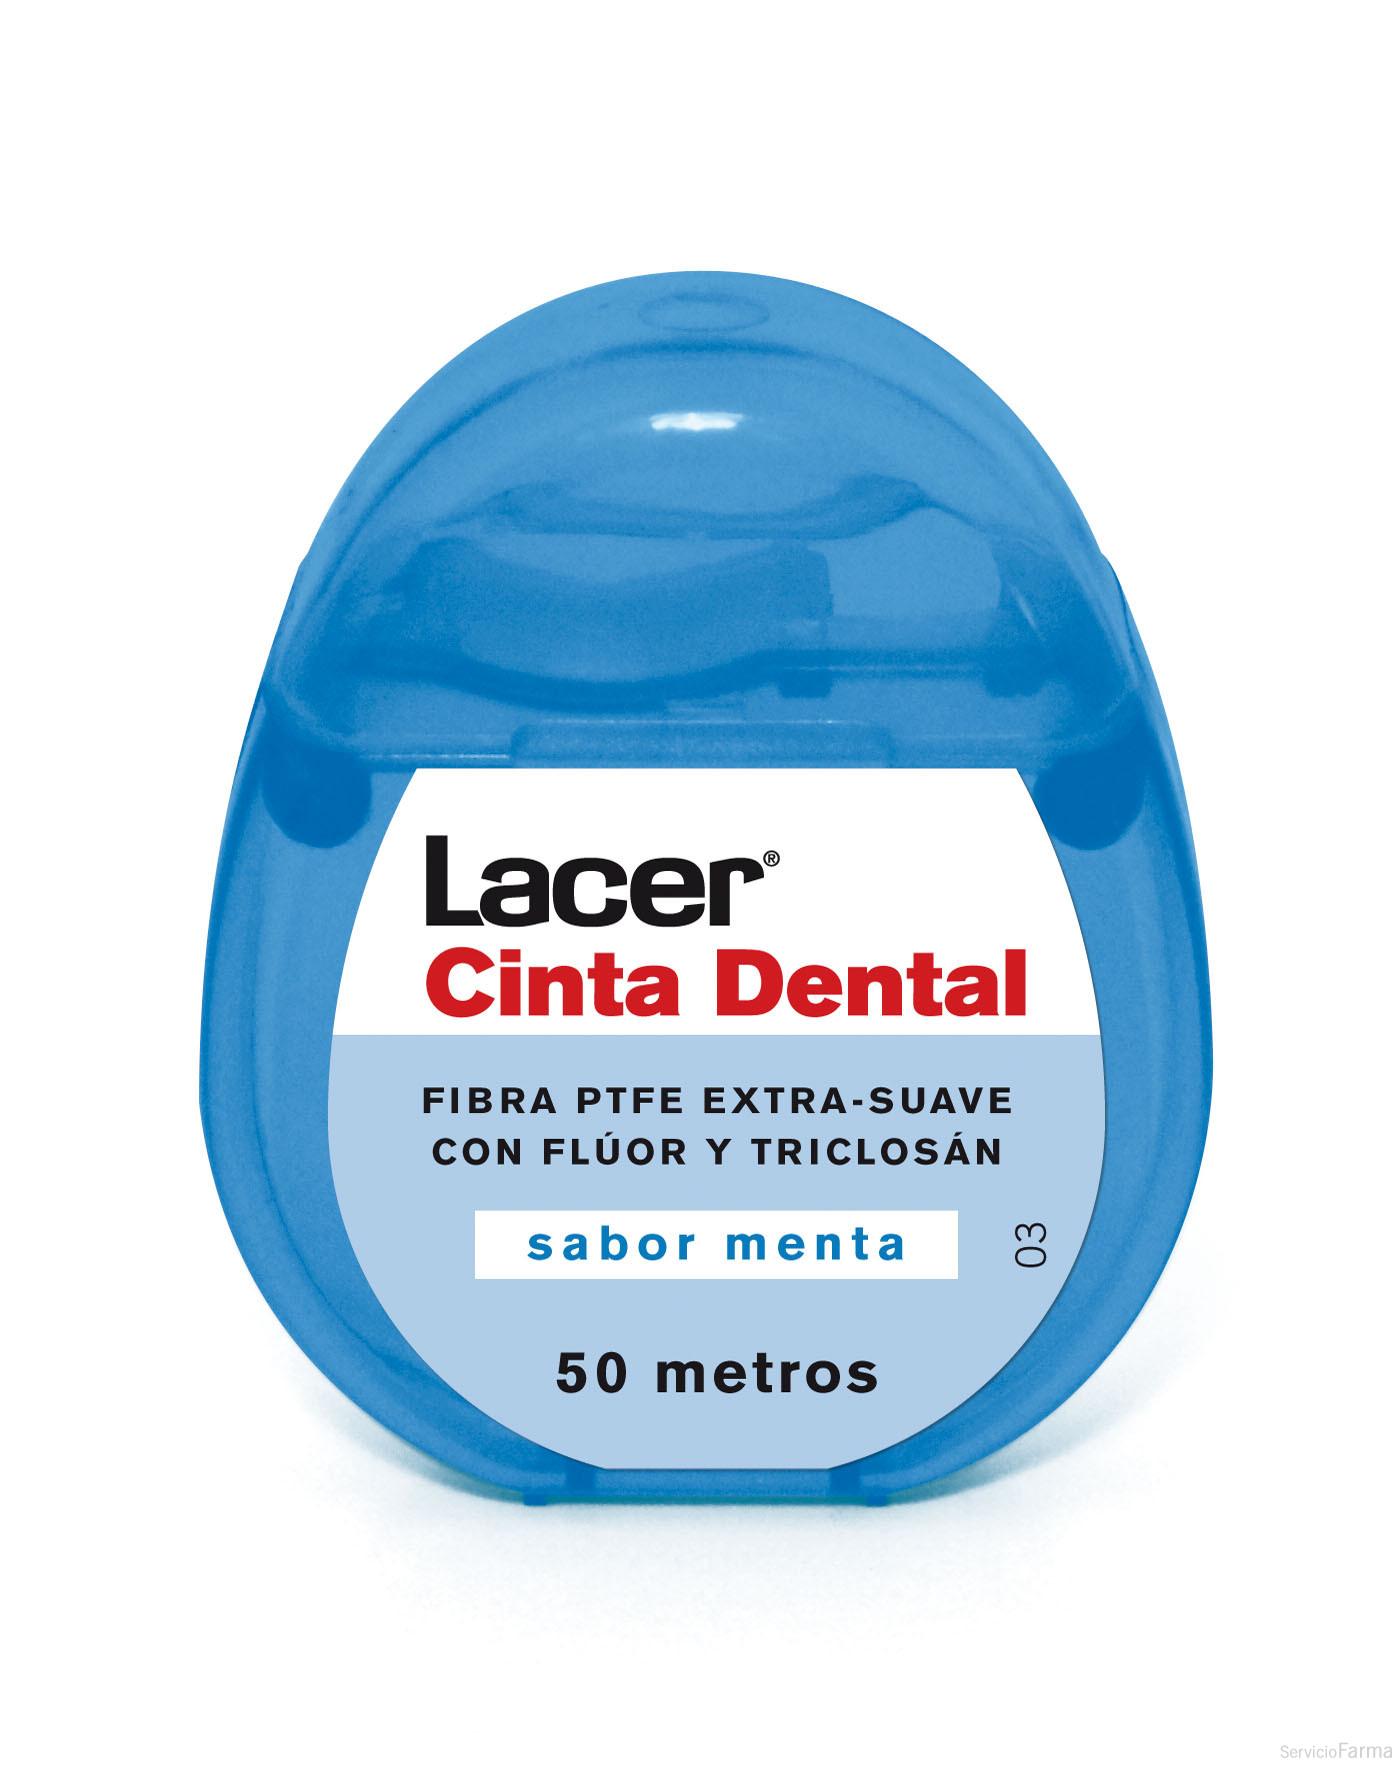 Lacer Cinta Dental Sabor Menta 50 m